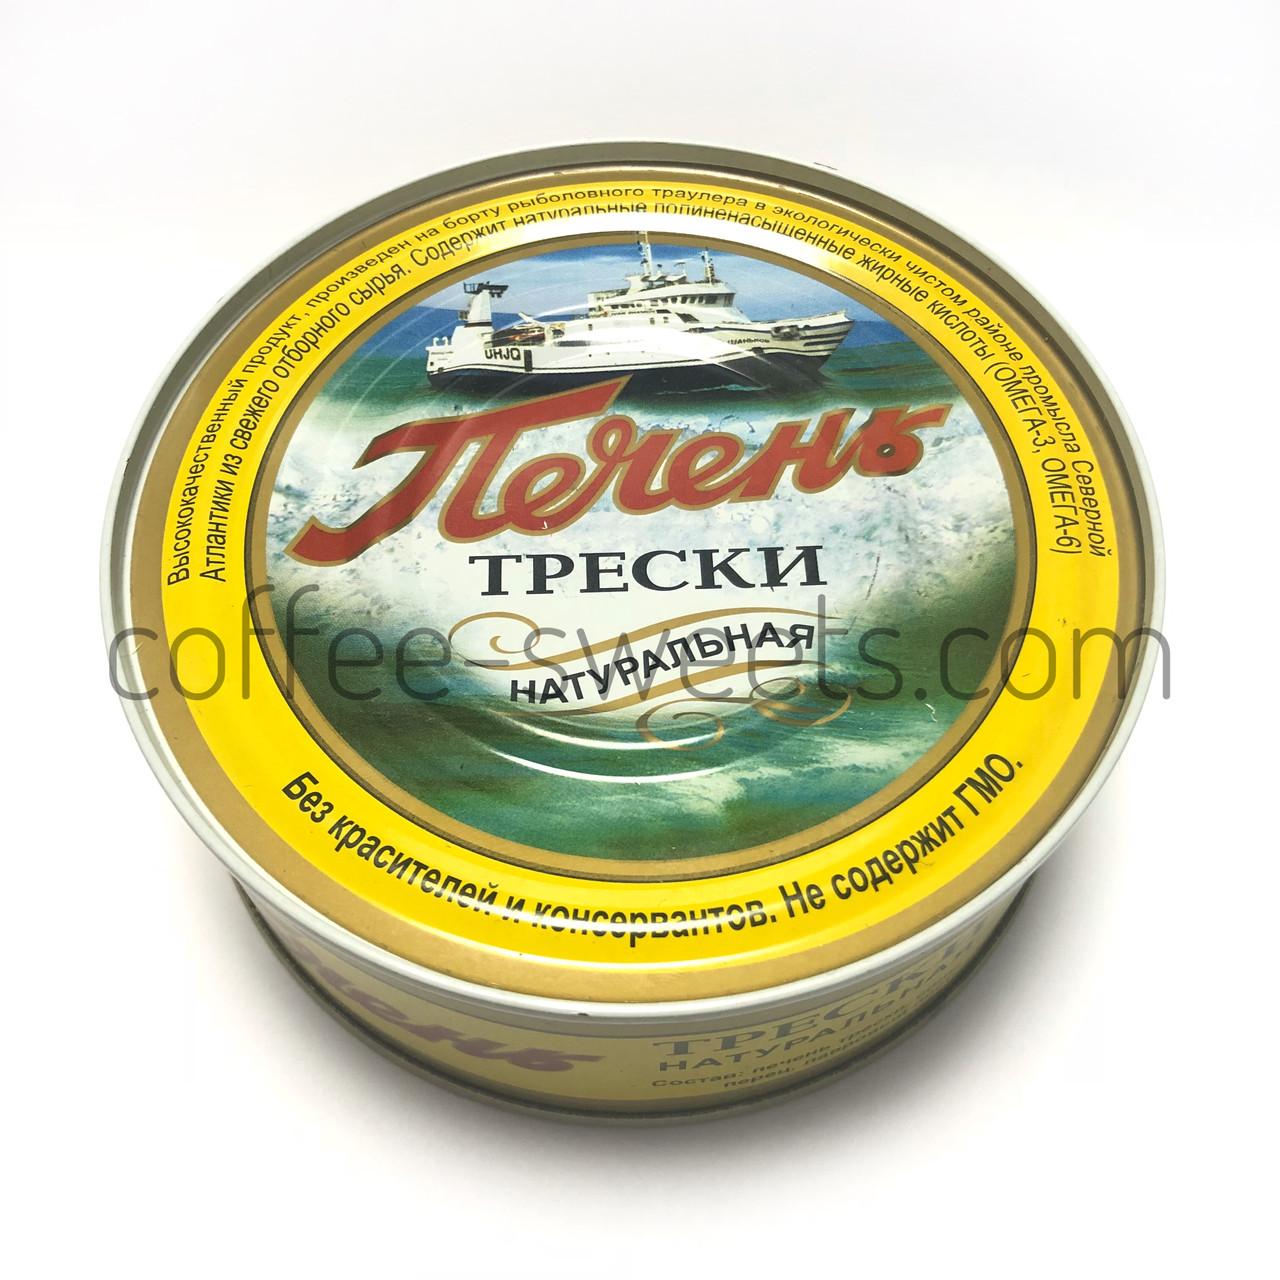 Печень трески натуральная МТФ 230 гр